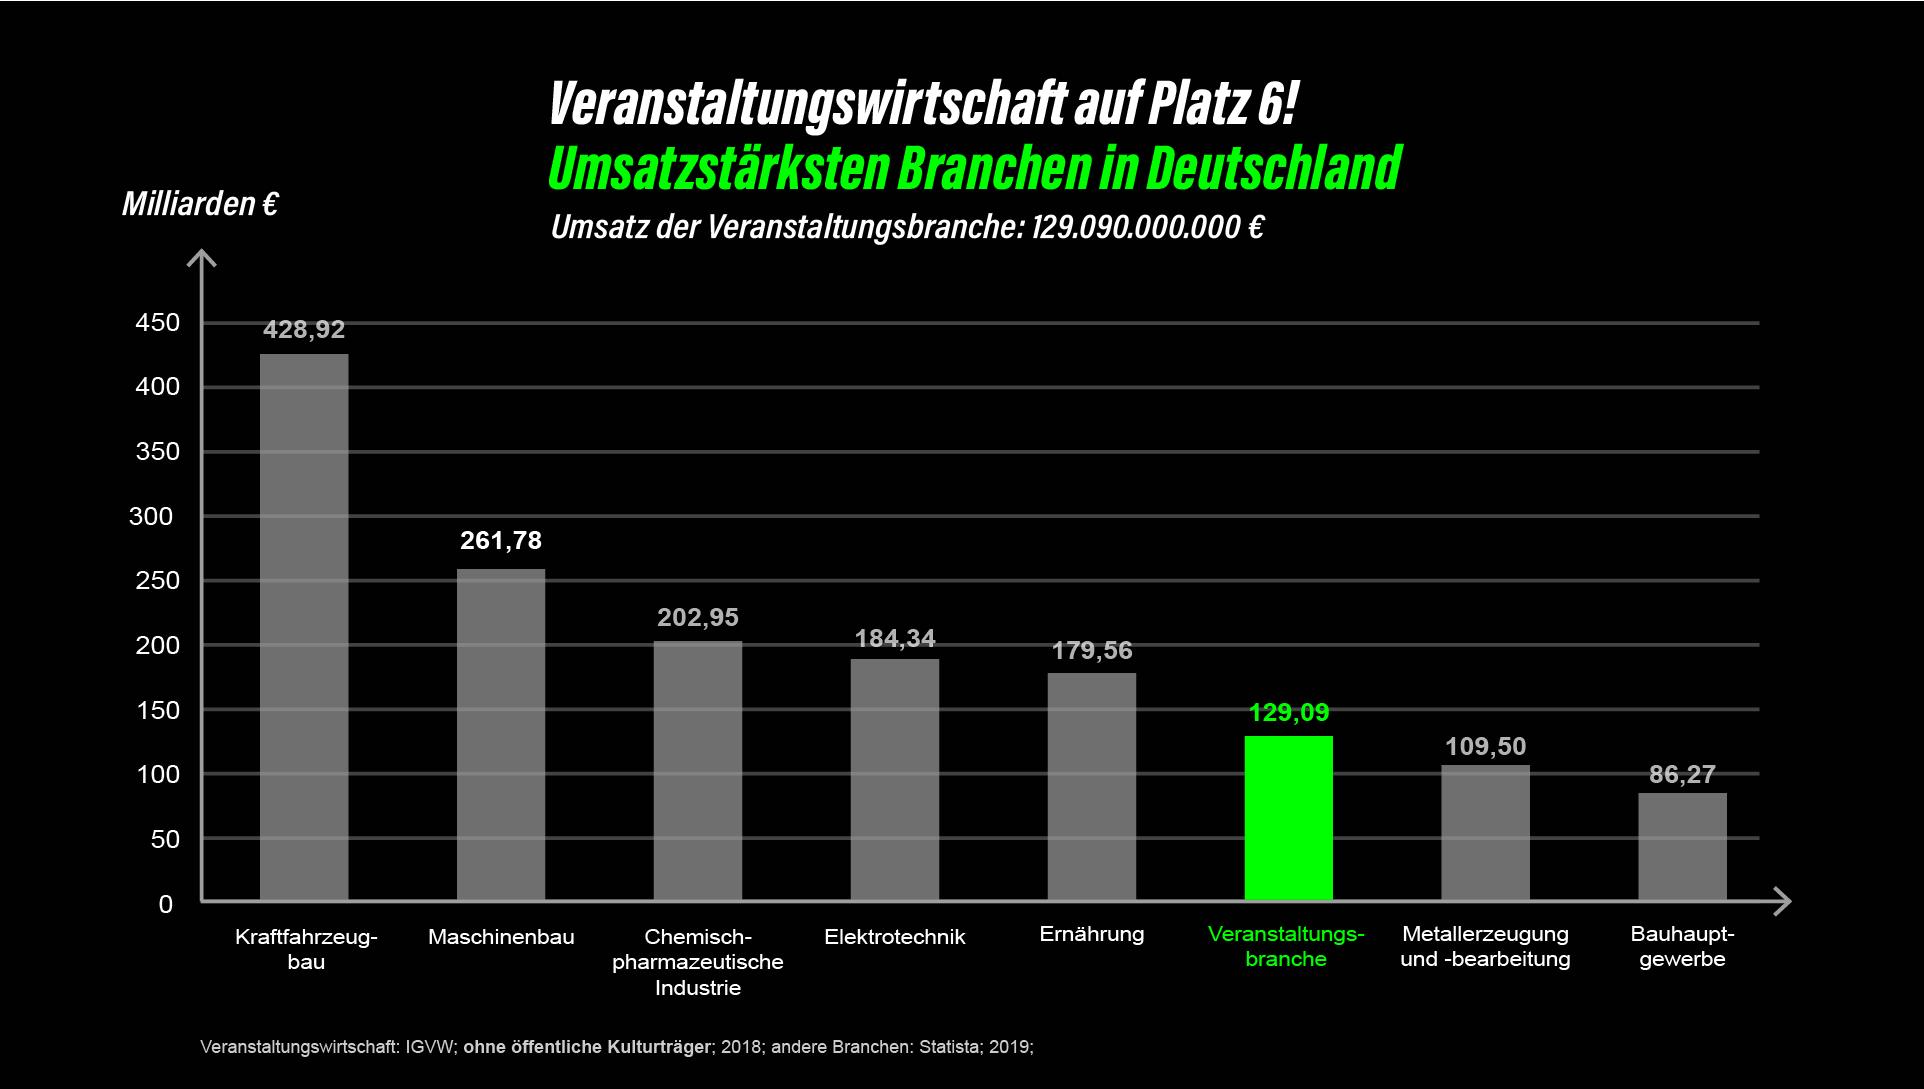 VW_Umsatzstärke